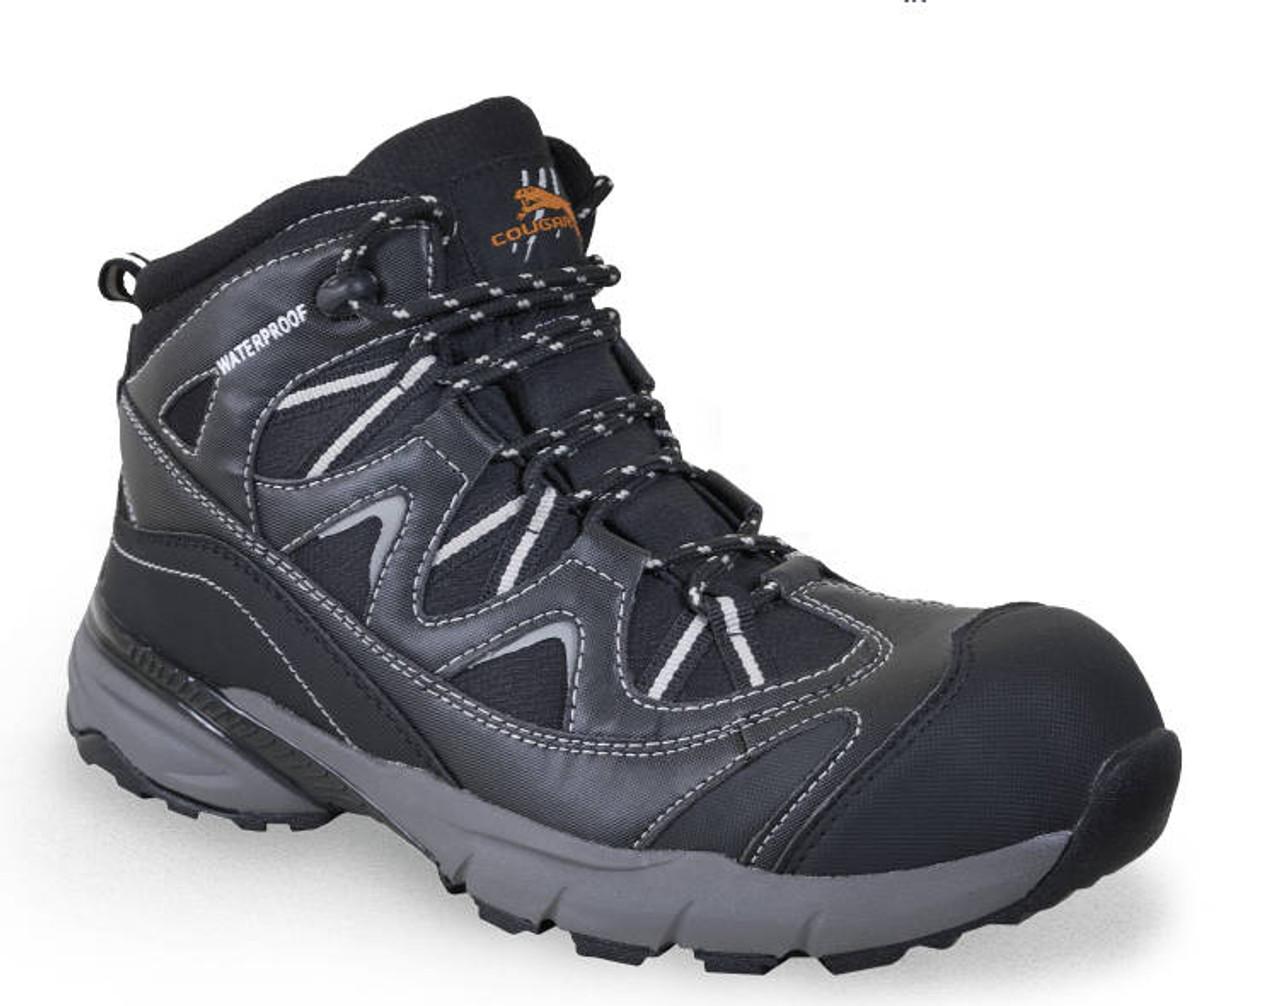 force boot coated dp men waterproof quot com s work amazon light leather weight boots brown carhartt